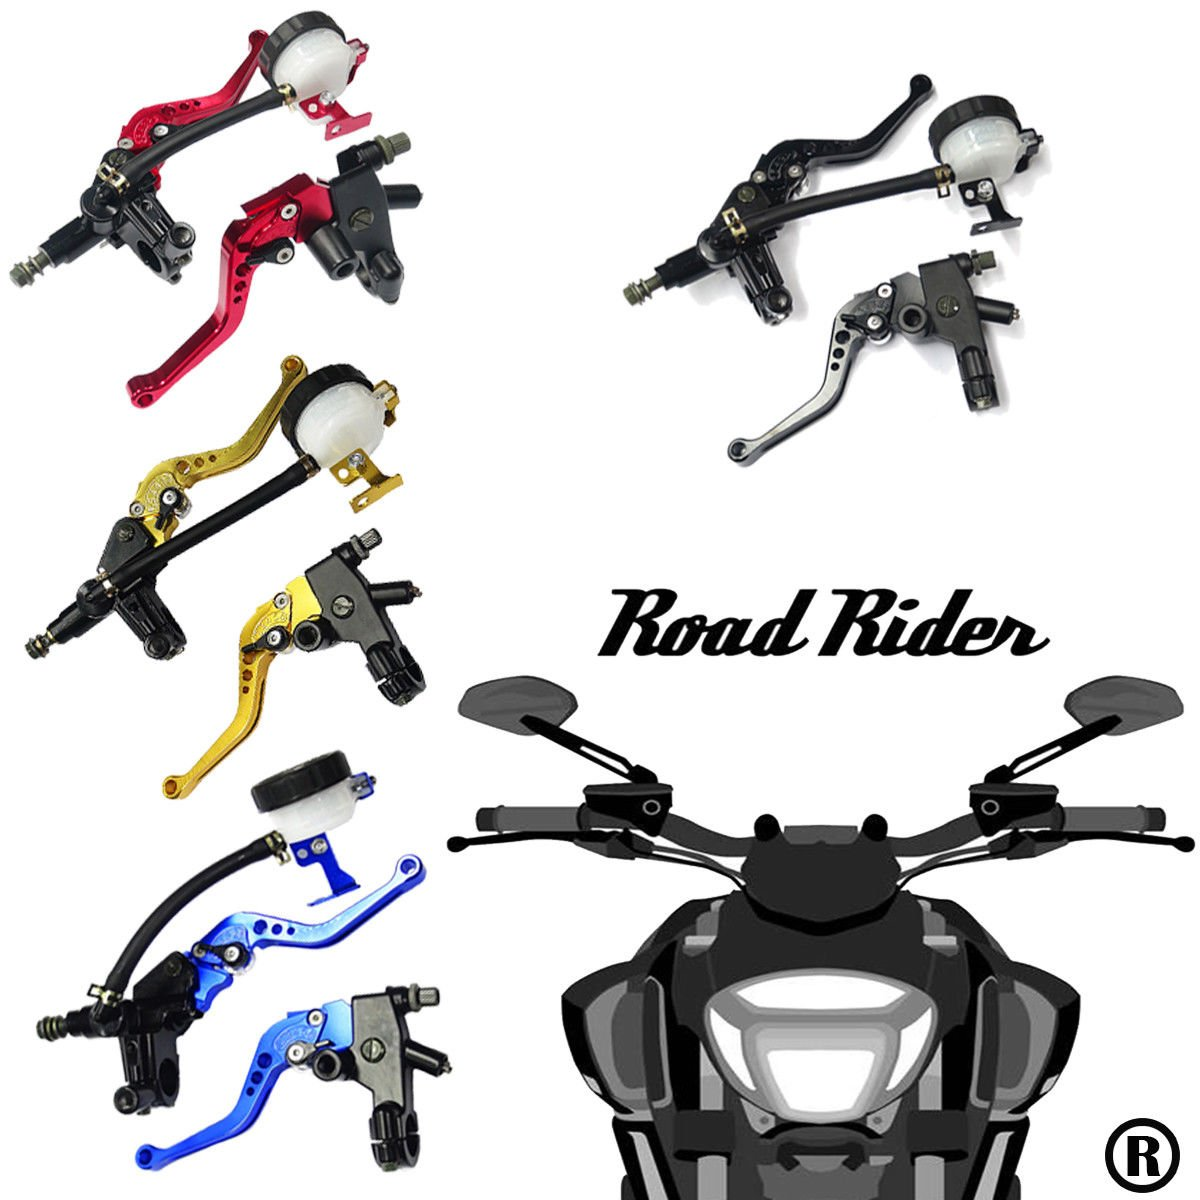 Universal Motorcycle 7/8'' 22mm Standard Handle Bar Adjustment Front Brake Master Cylinder Clutch Lever For Sport Bike/Street Bike/Scooter/Dirt Bike(Red) by How Do You Do (Image #4)